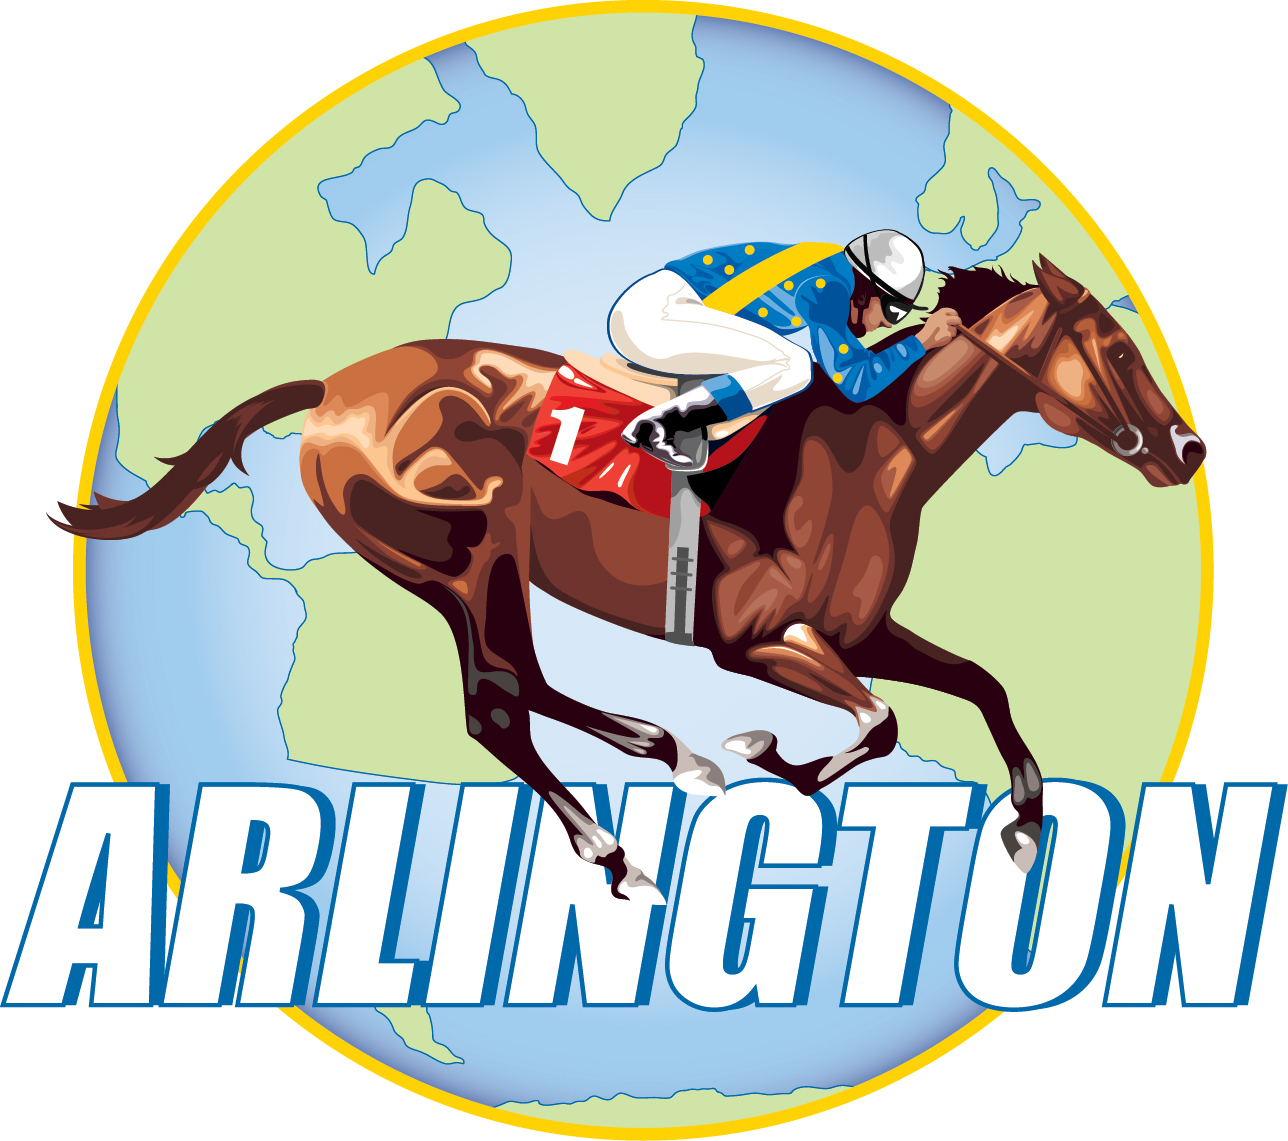 2016 Arlington International Globe.jpg